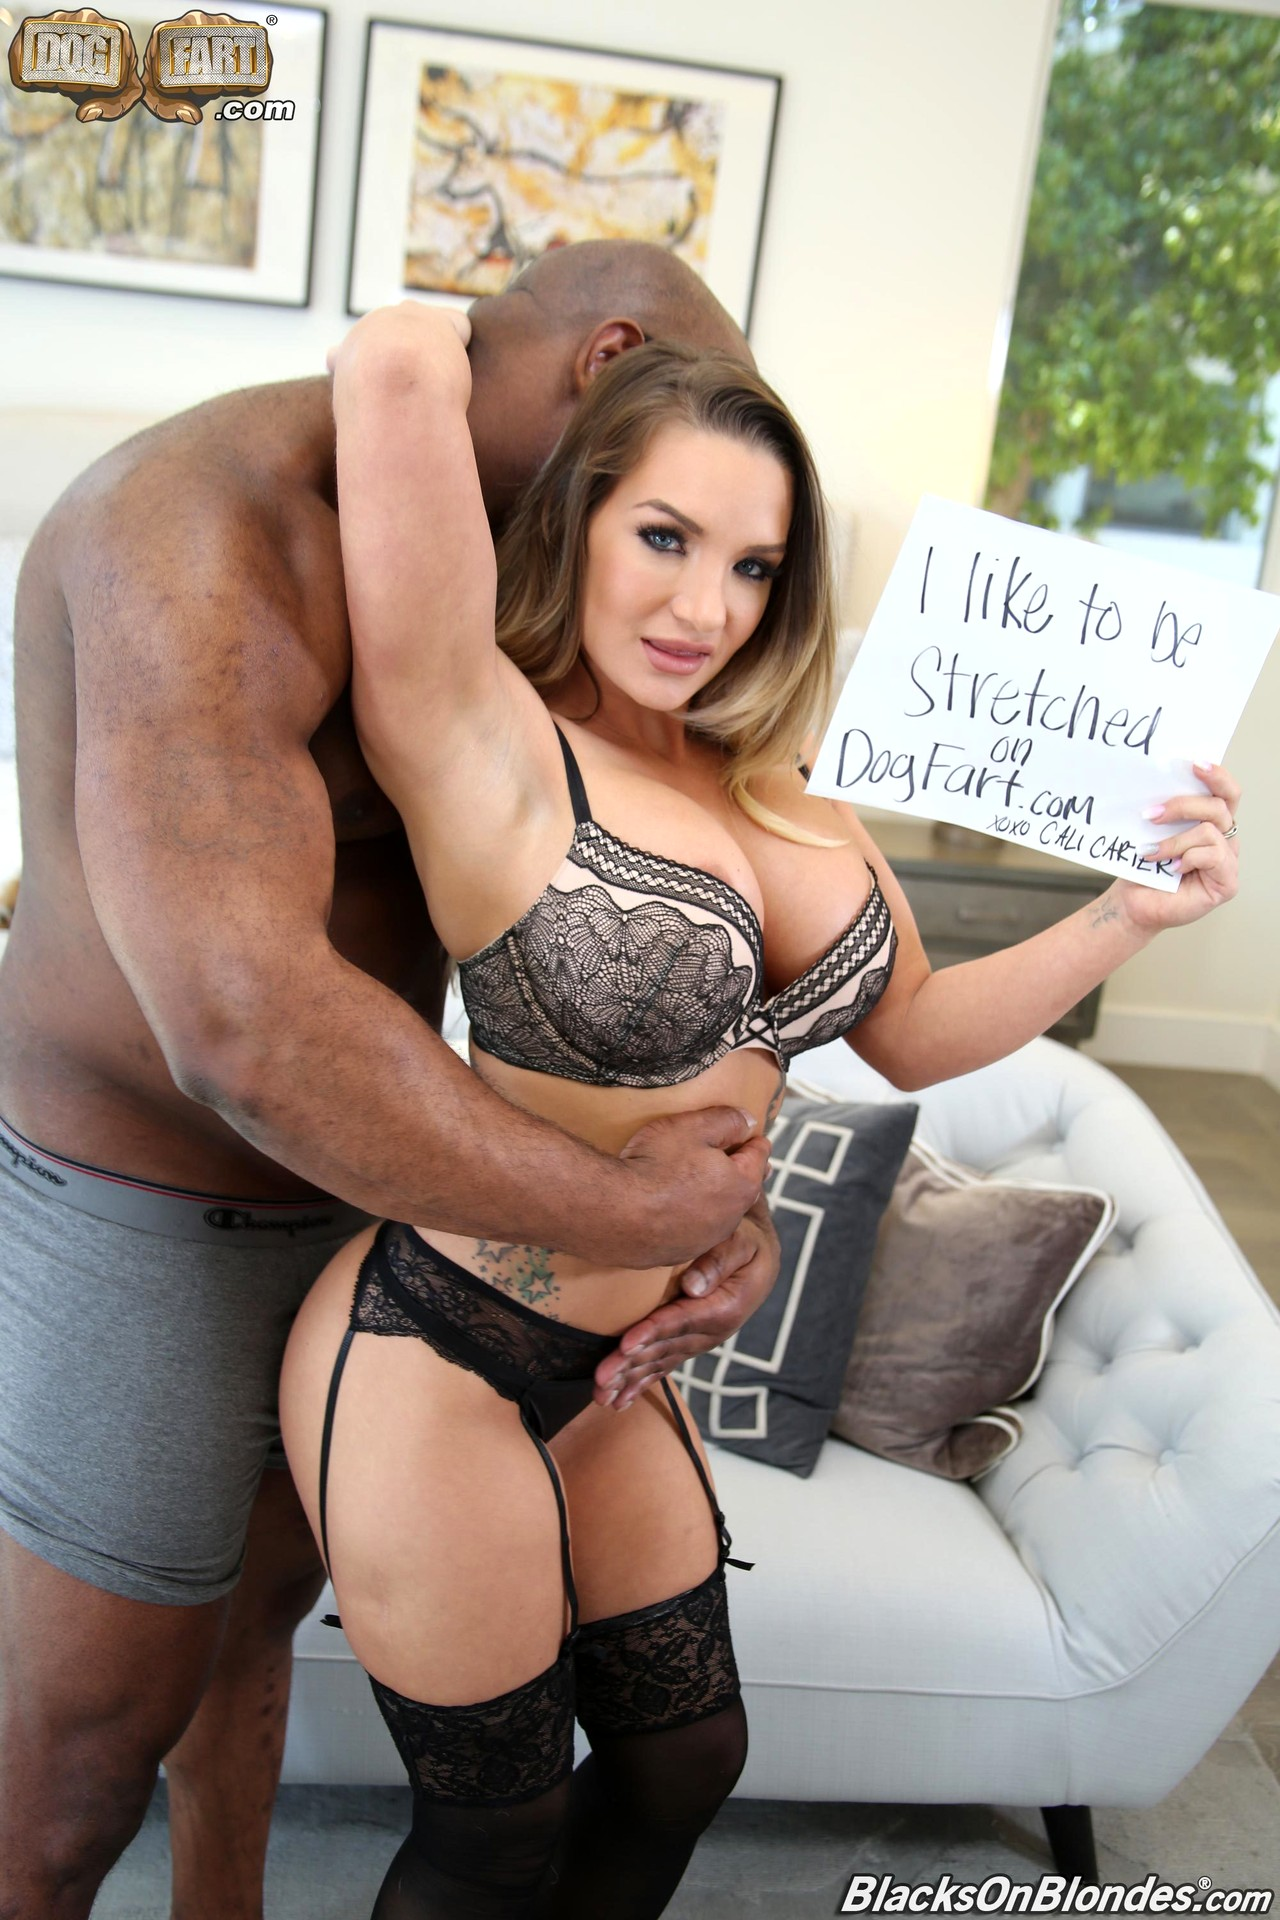 Carter porn cali Free Cali